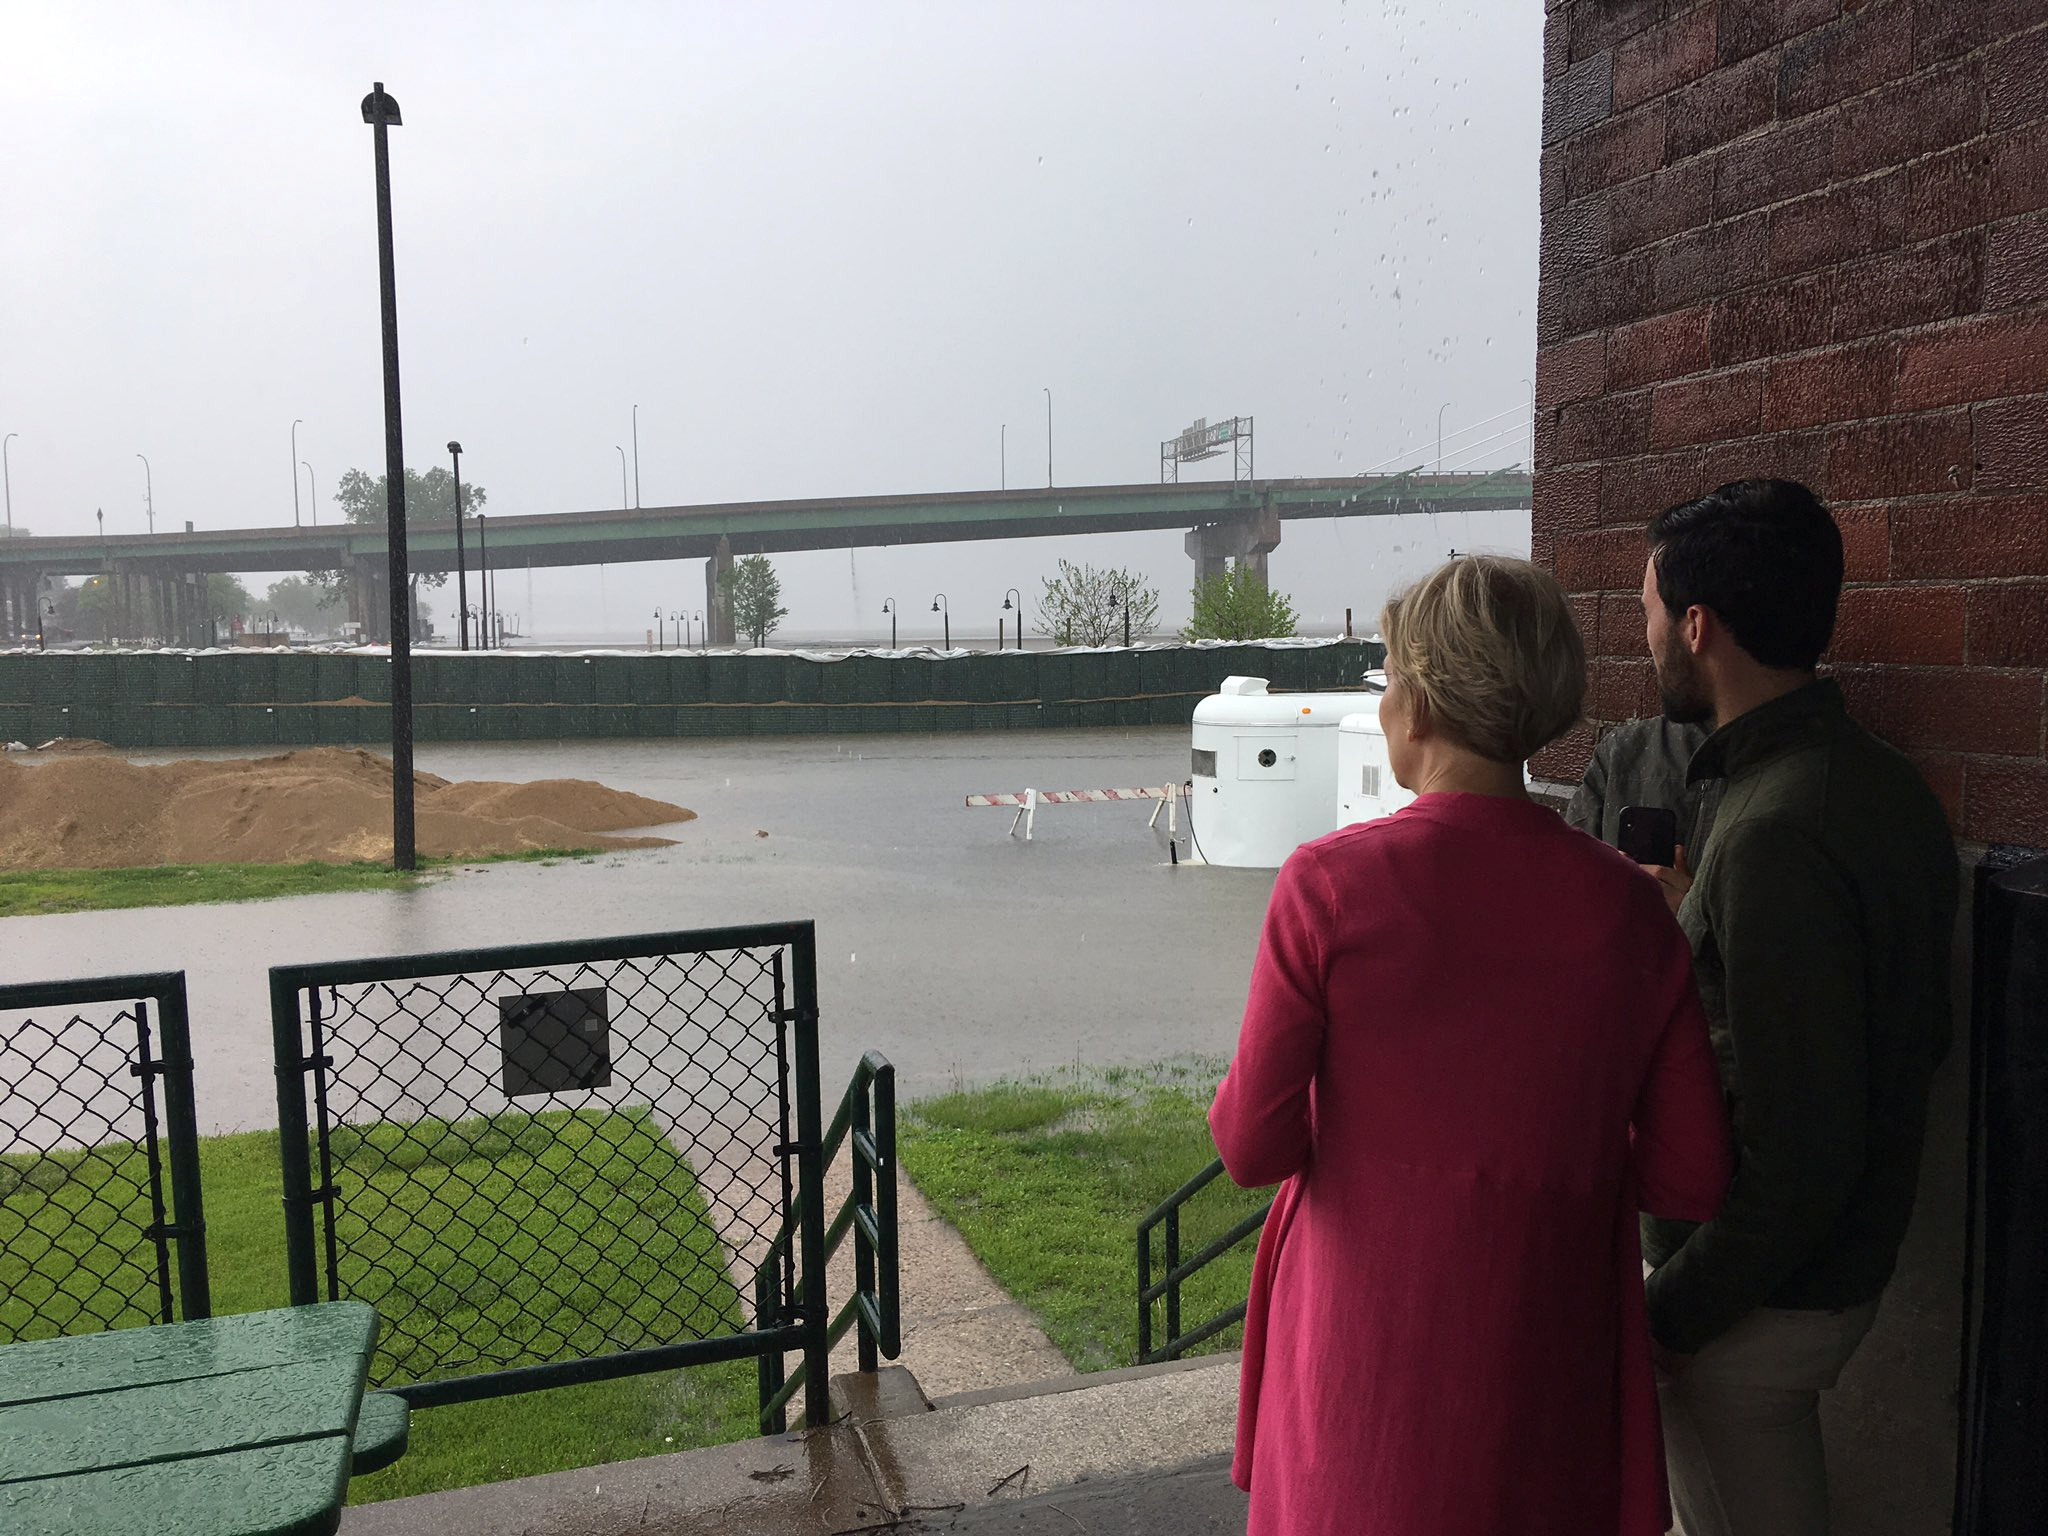 Democratic 2020 presidential candidate Elizabeth Warren campaigns during a tornado warning in Burlington